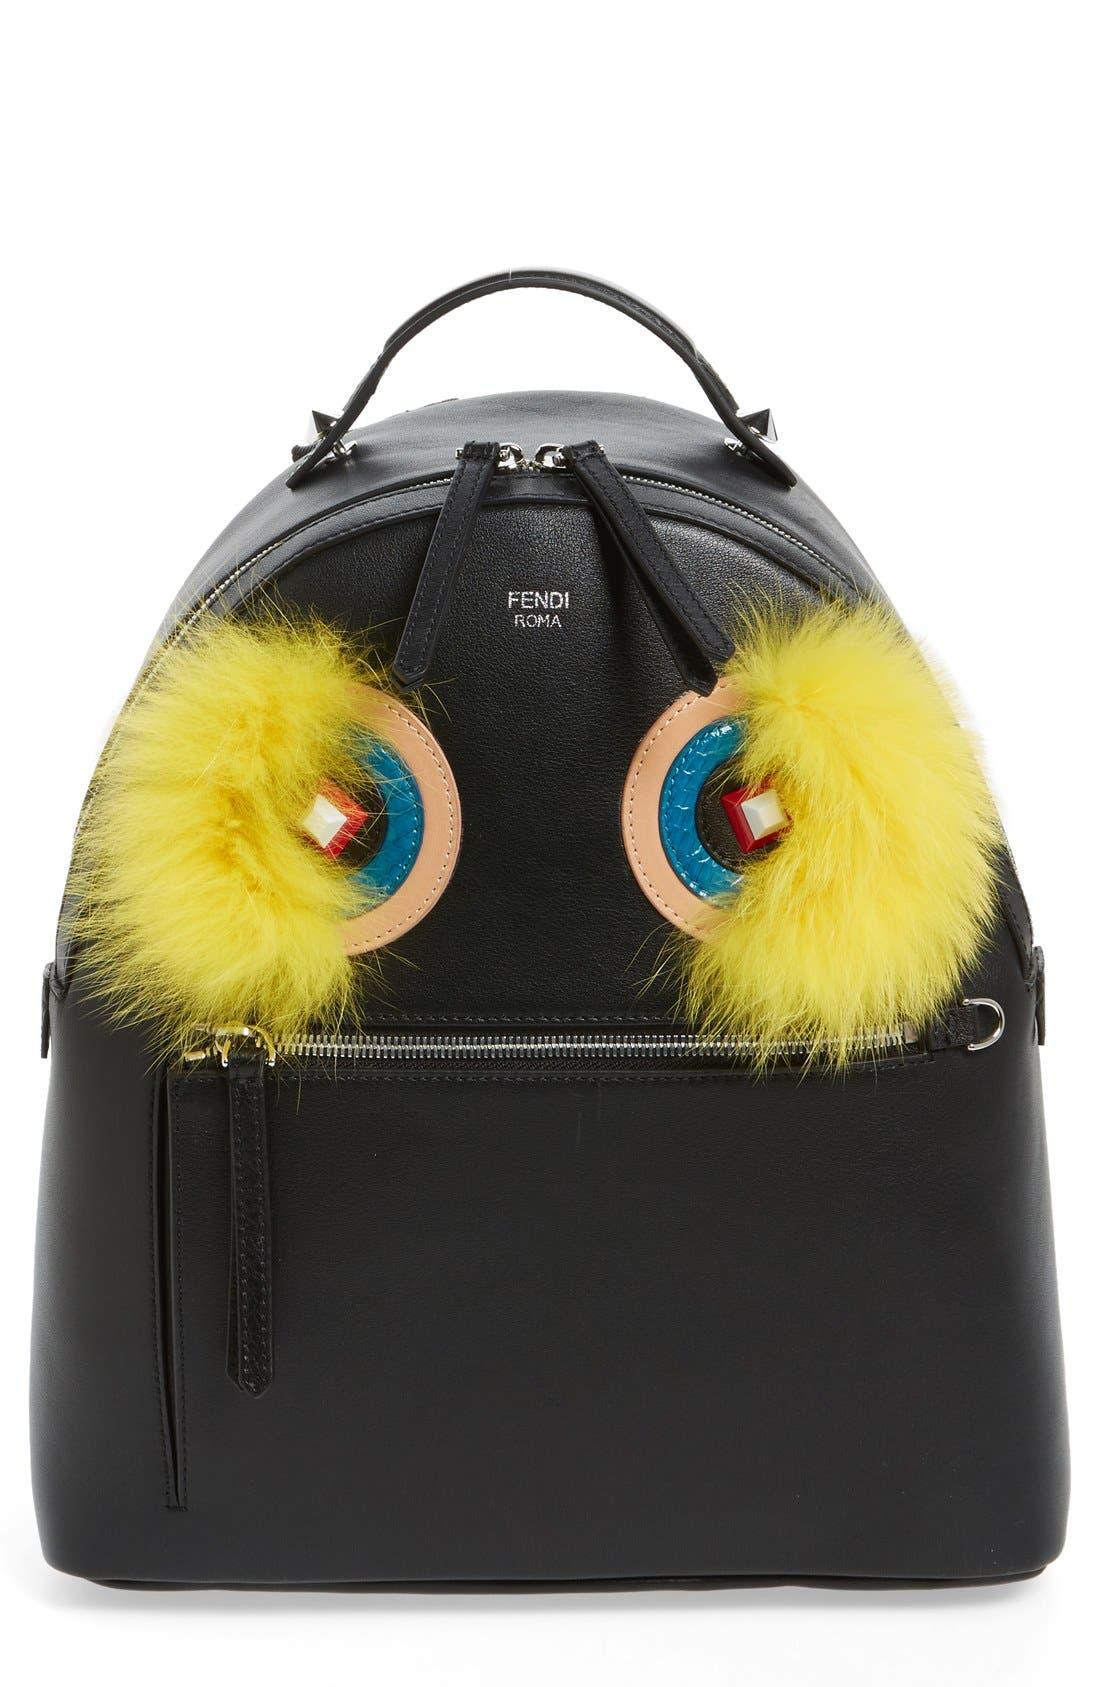 Main Image - Fendi 'Monster' Leather Backpack with Genuine Fox Fur & Snakeskin Trim